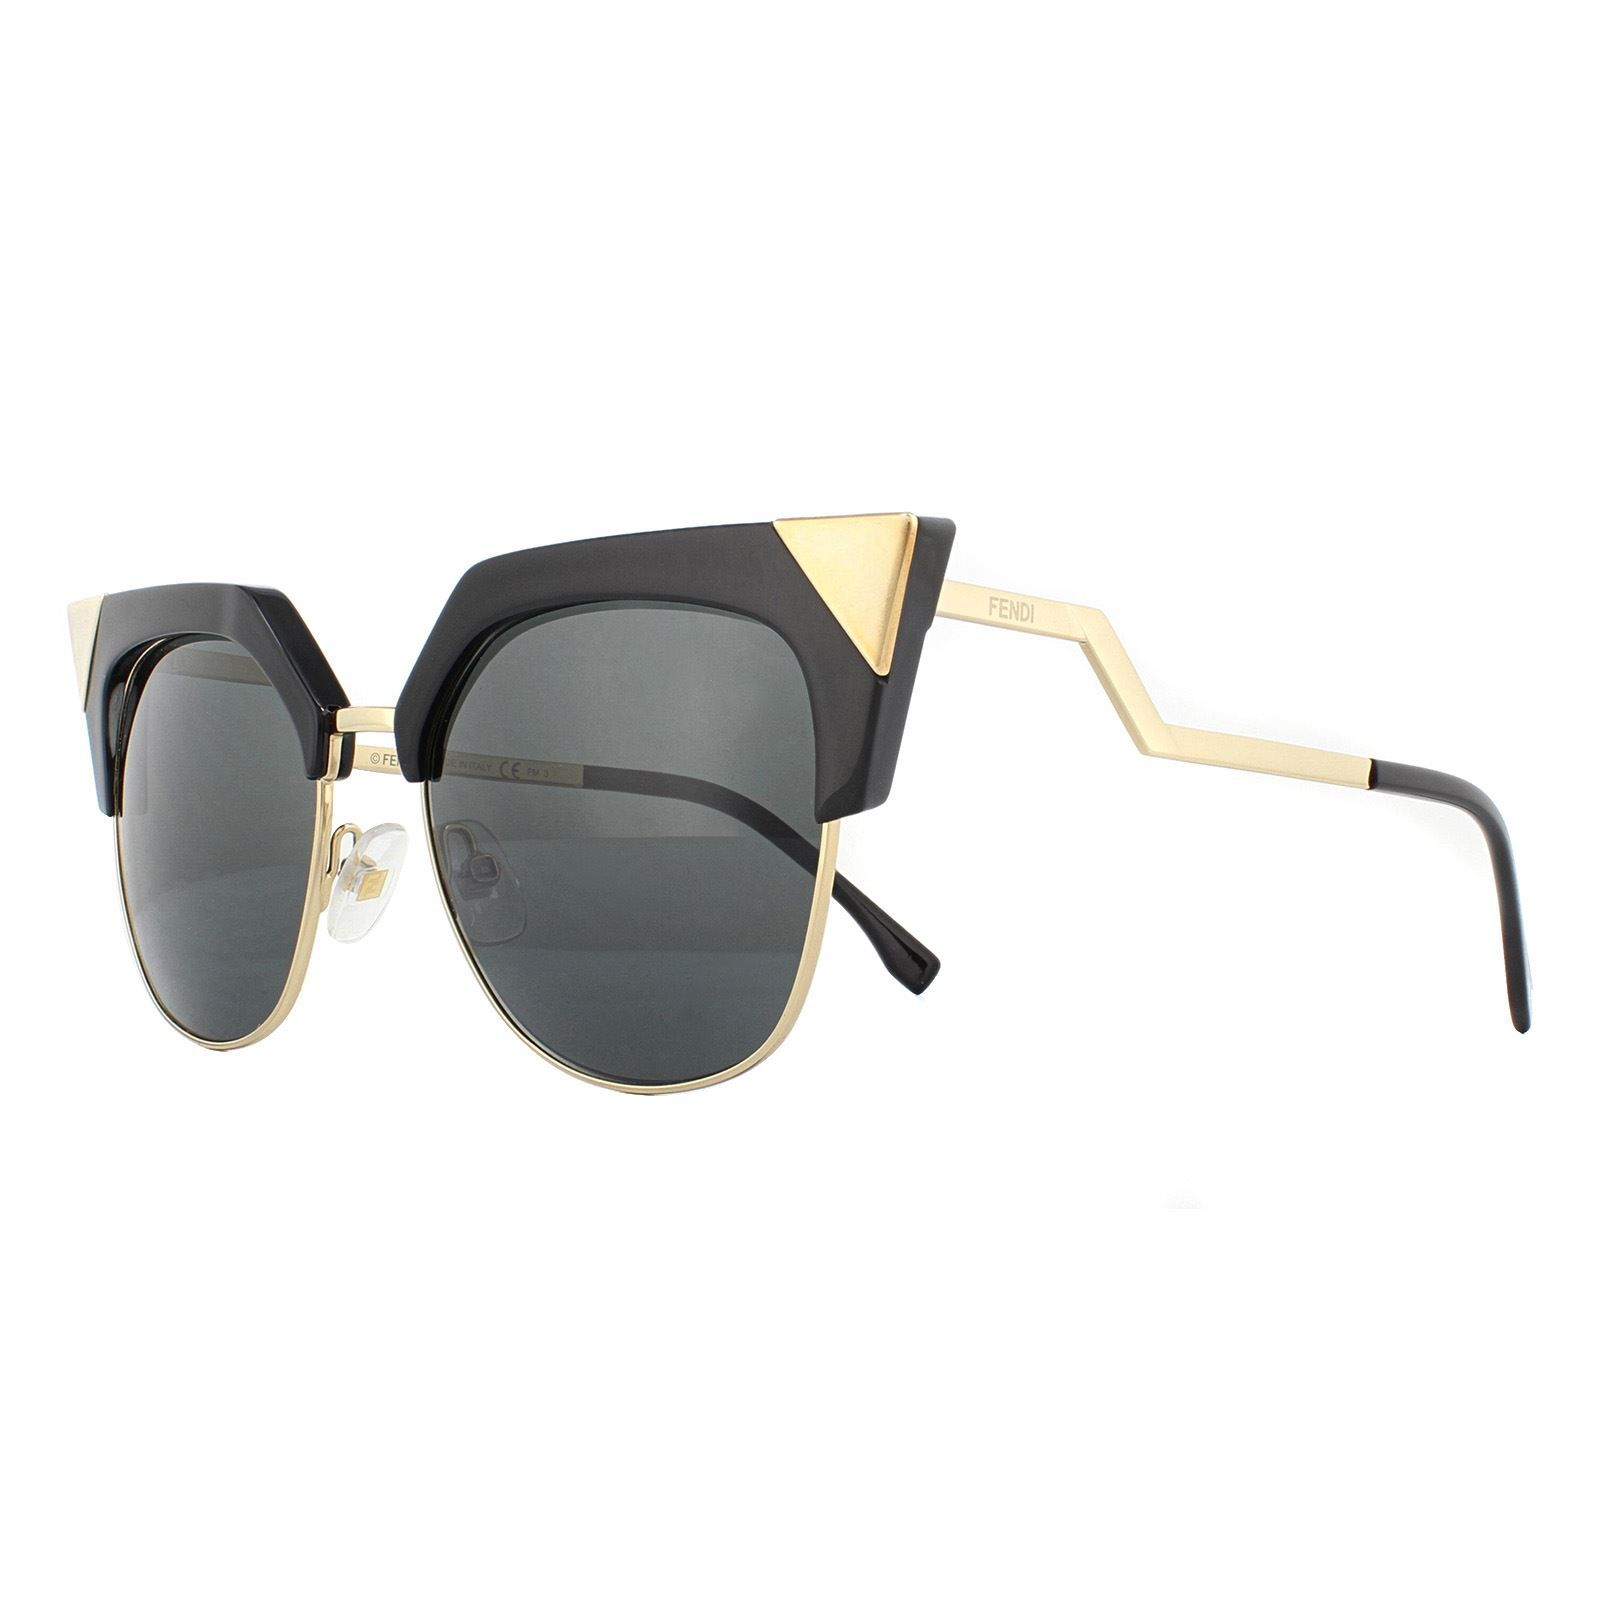 Fendi Sunglasses FF 0149/S REW/P9 Black Gold Grey